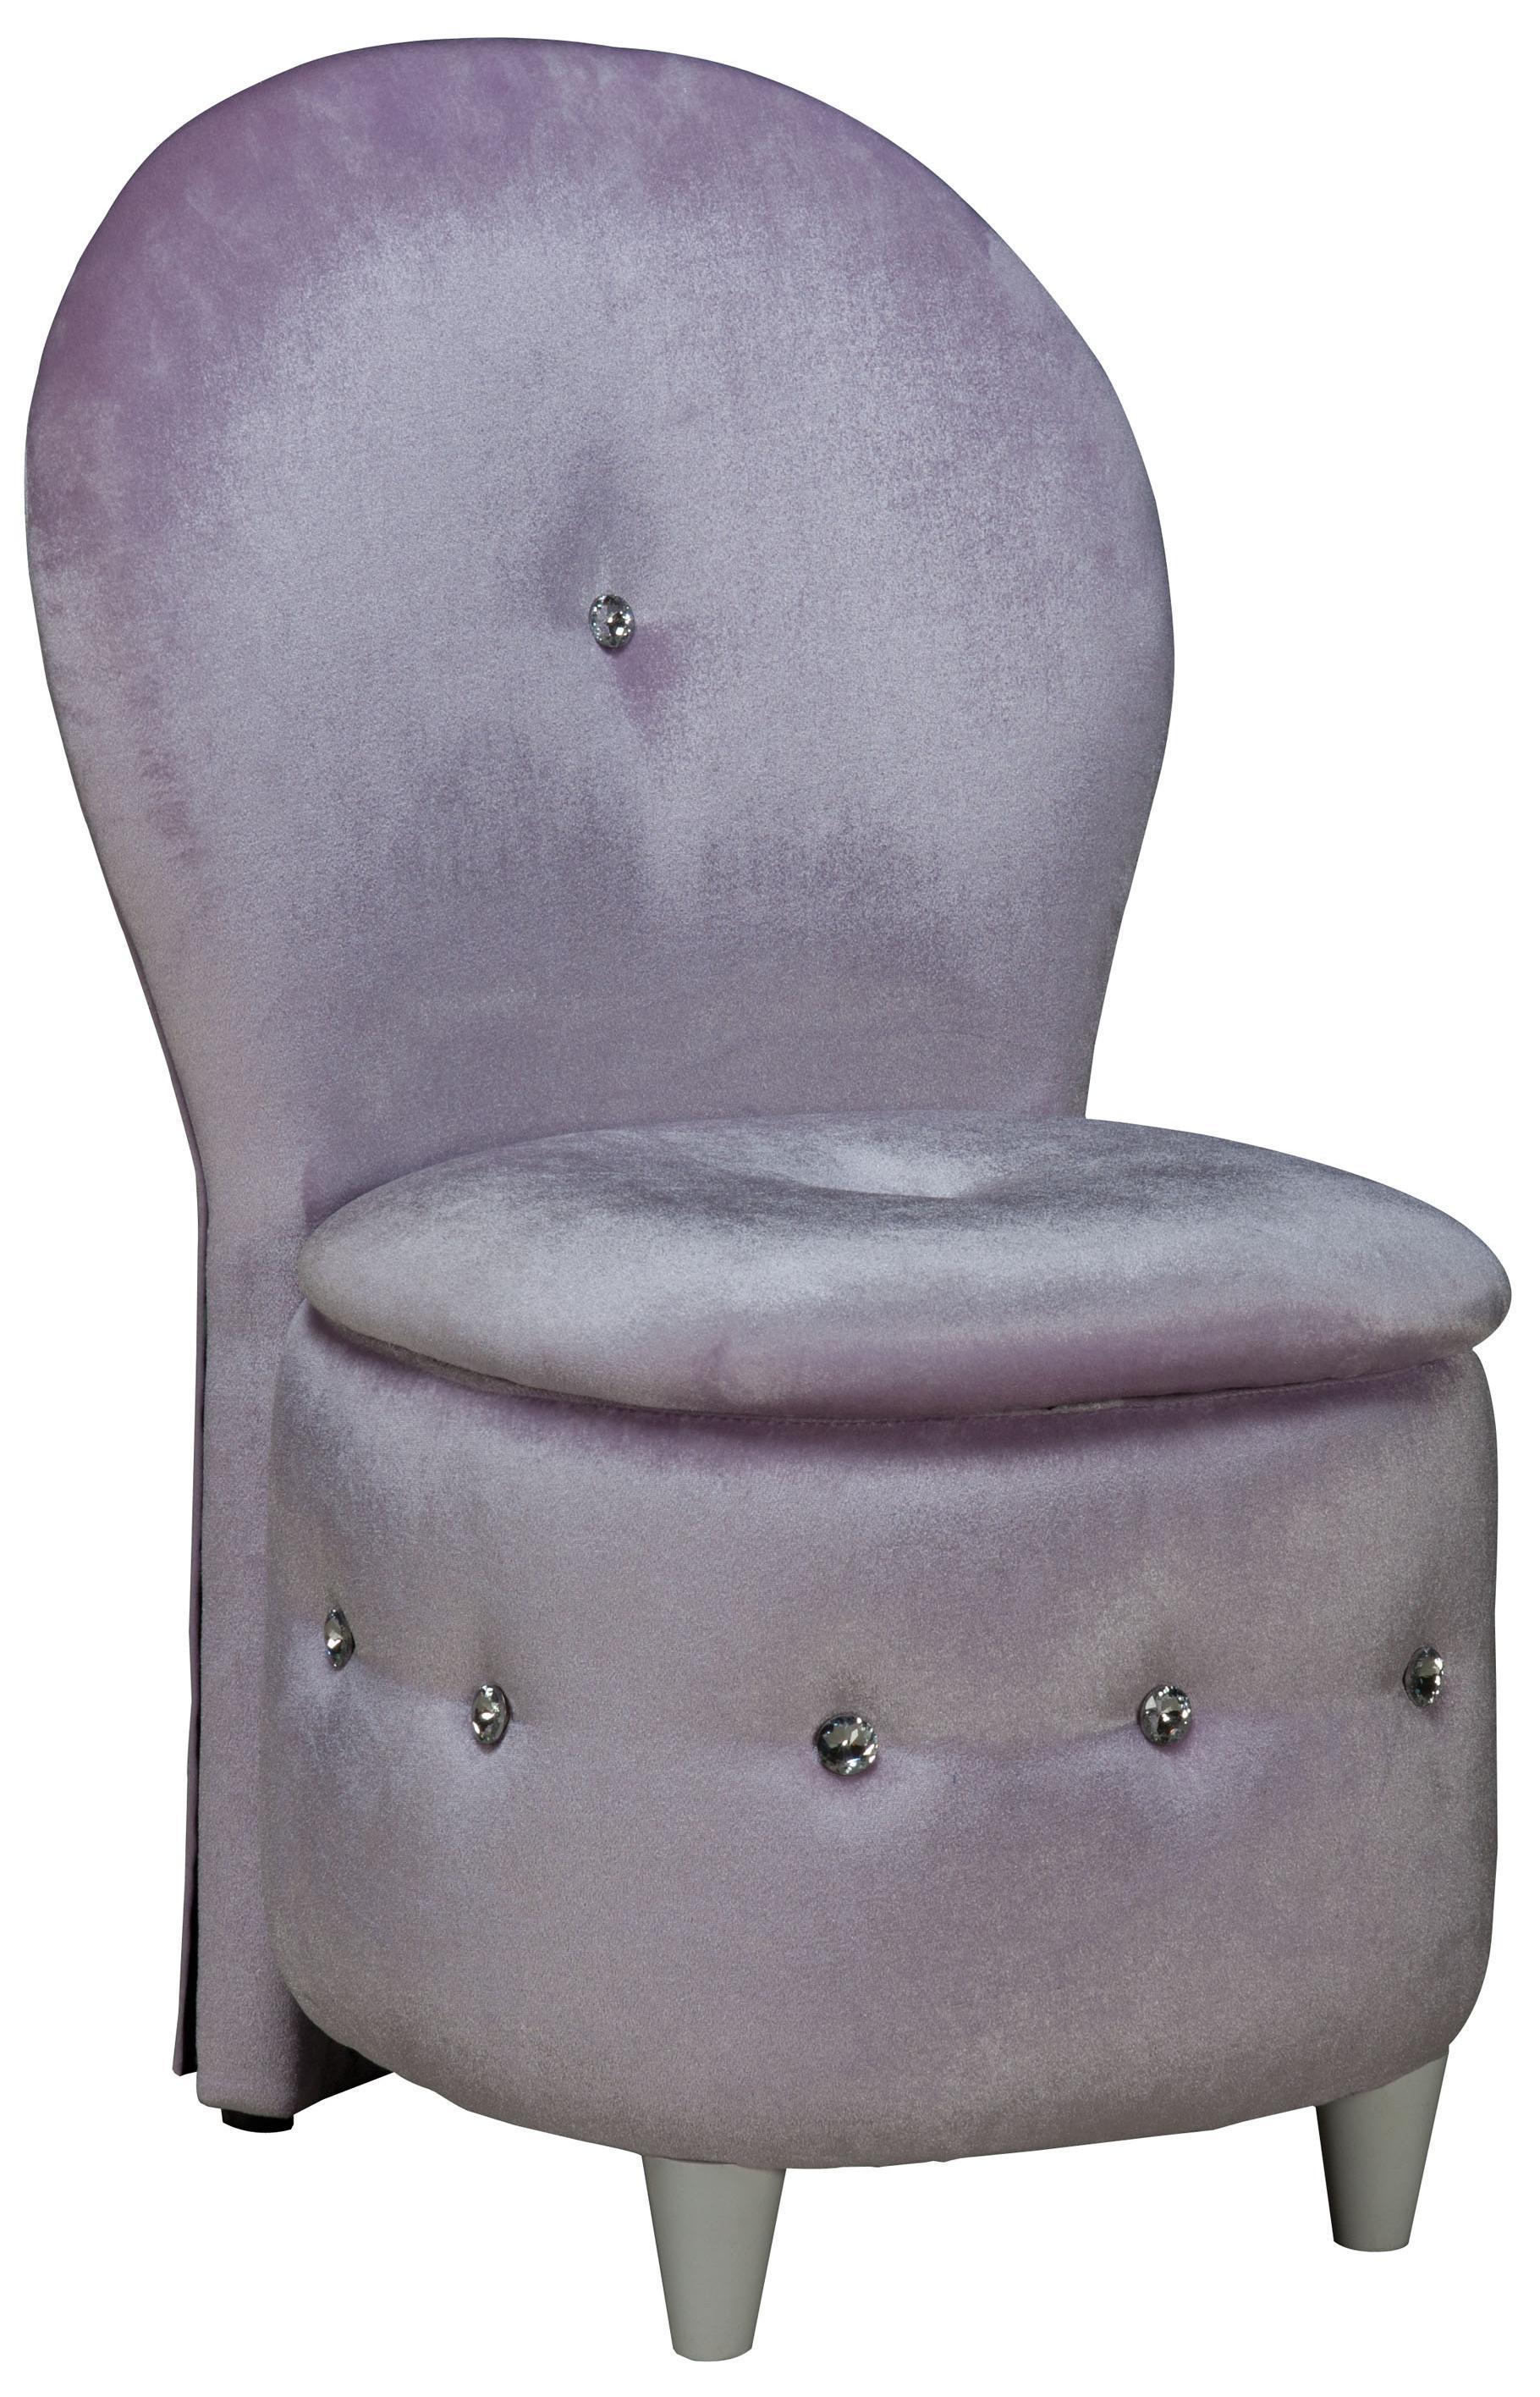 macy stool chair grey posture office standard furniture sit n store lavendar velvet with storage cushion